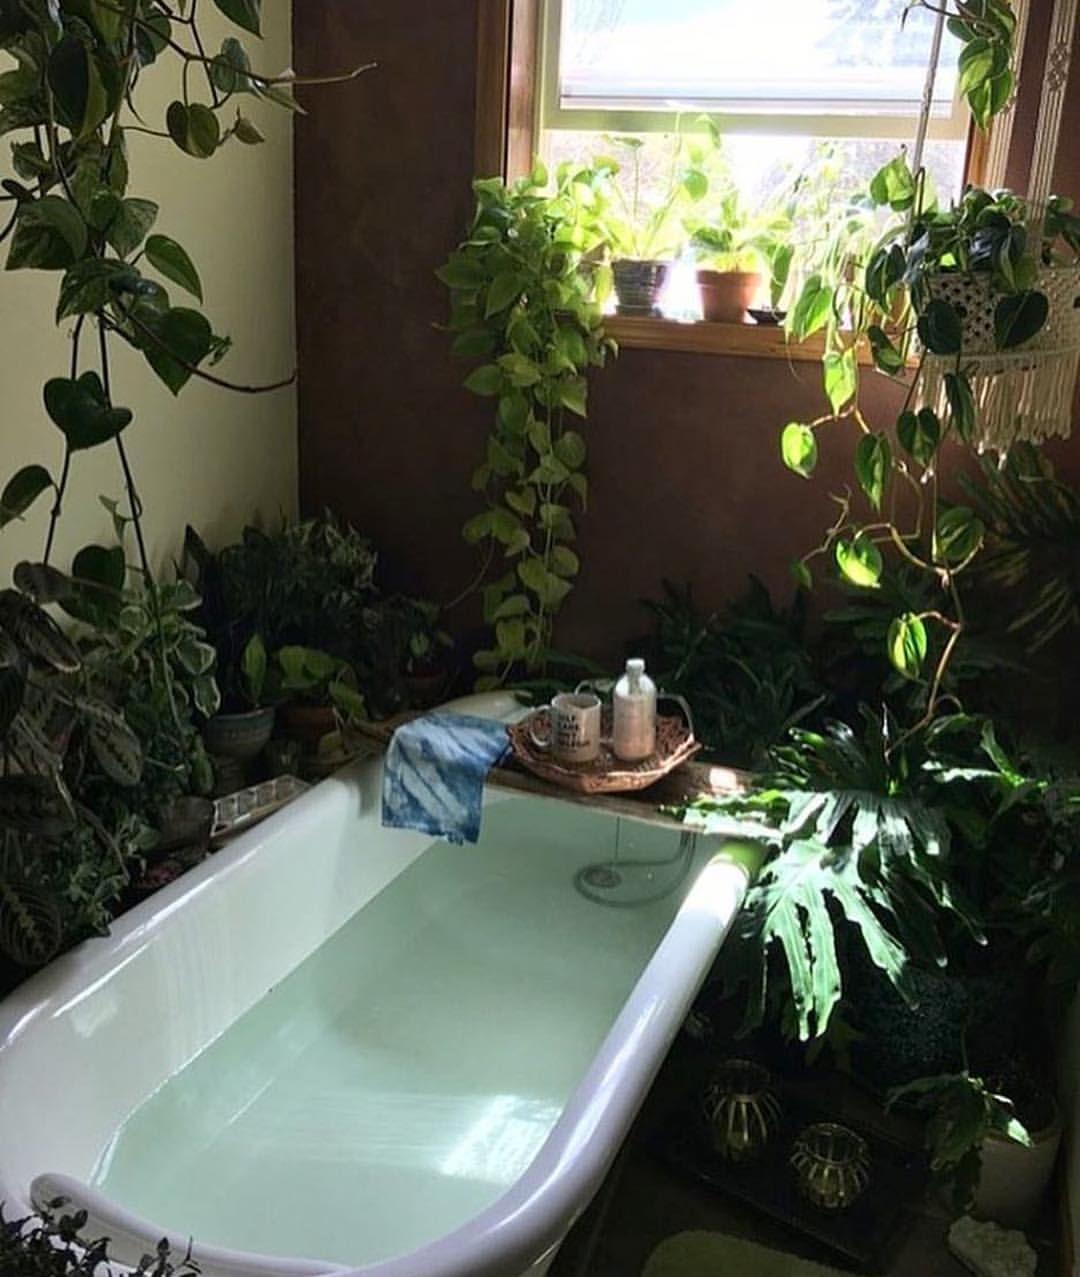 Bathroom おしゃれまとめの人気アイデア Pinterest Micoeste